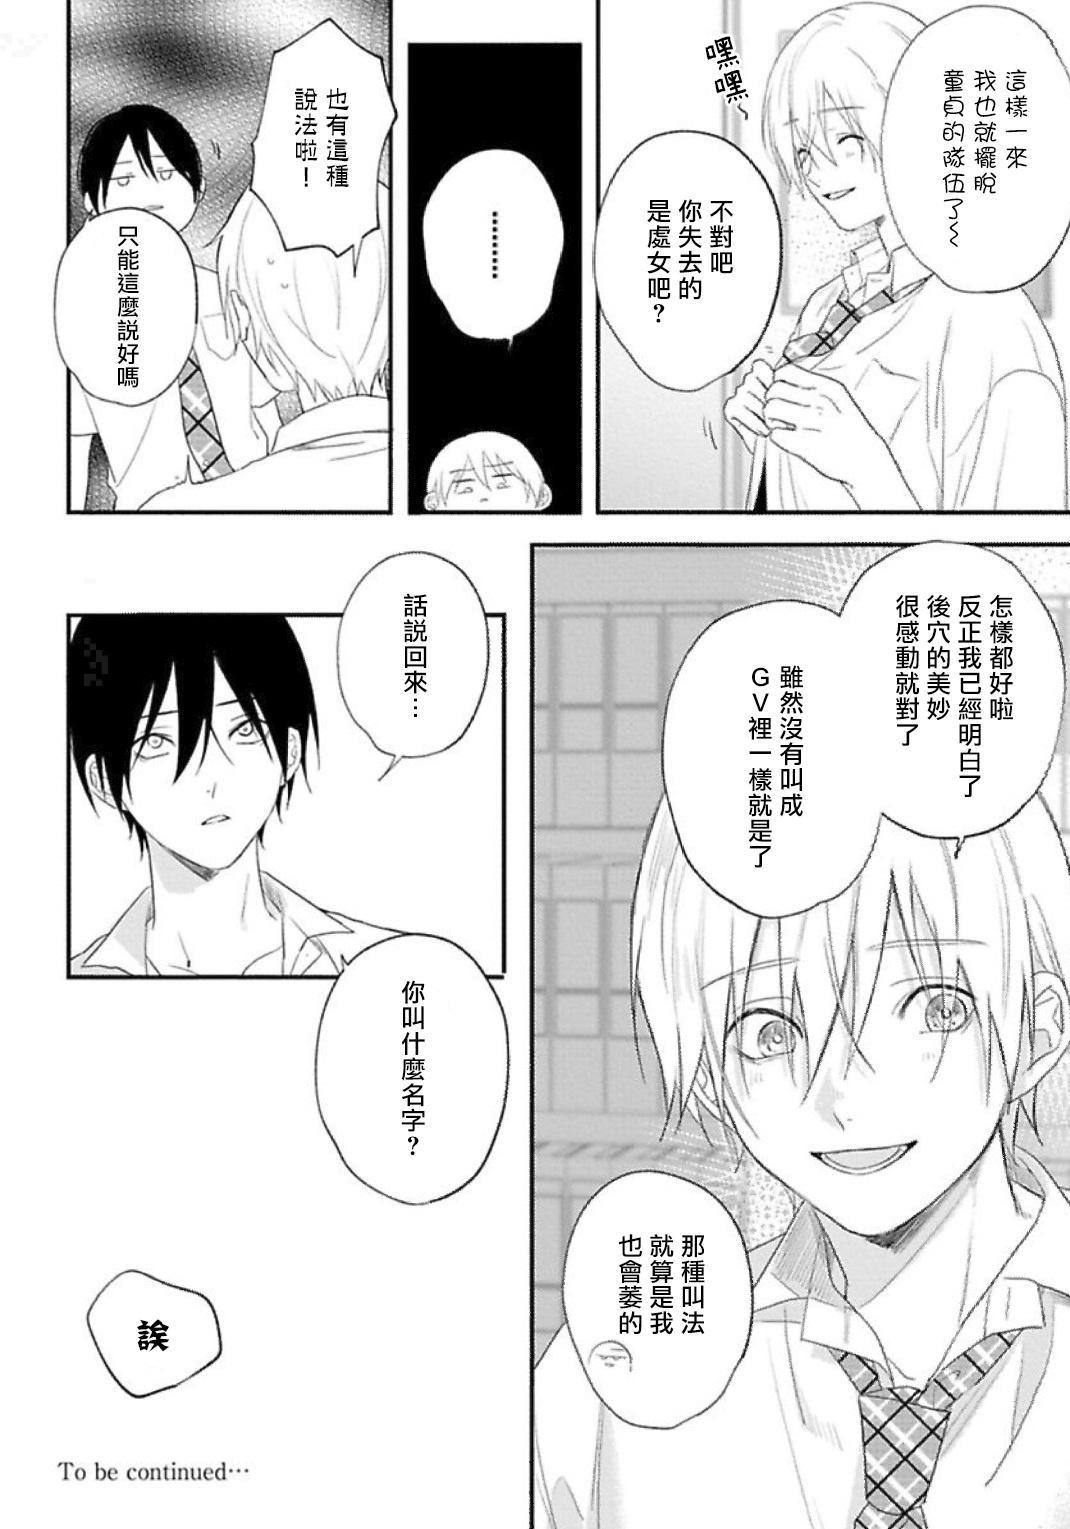 [Utata Hakuto] Houkago Virginity - Virginity afterschool 1-3 [Chinese] [拾荒者汉化组] [Digital] 33